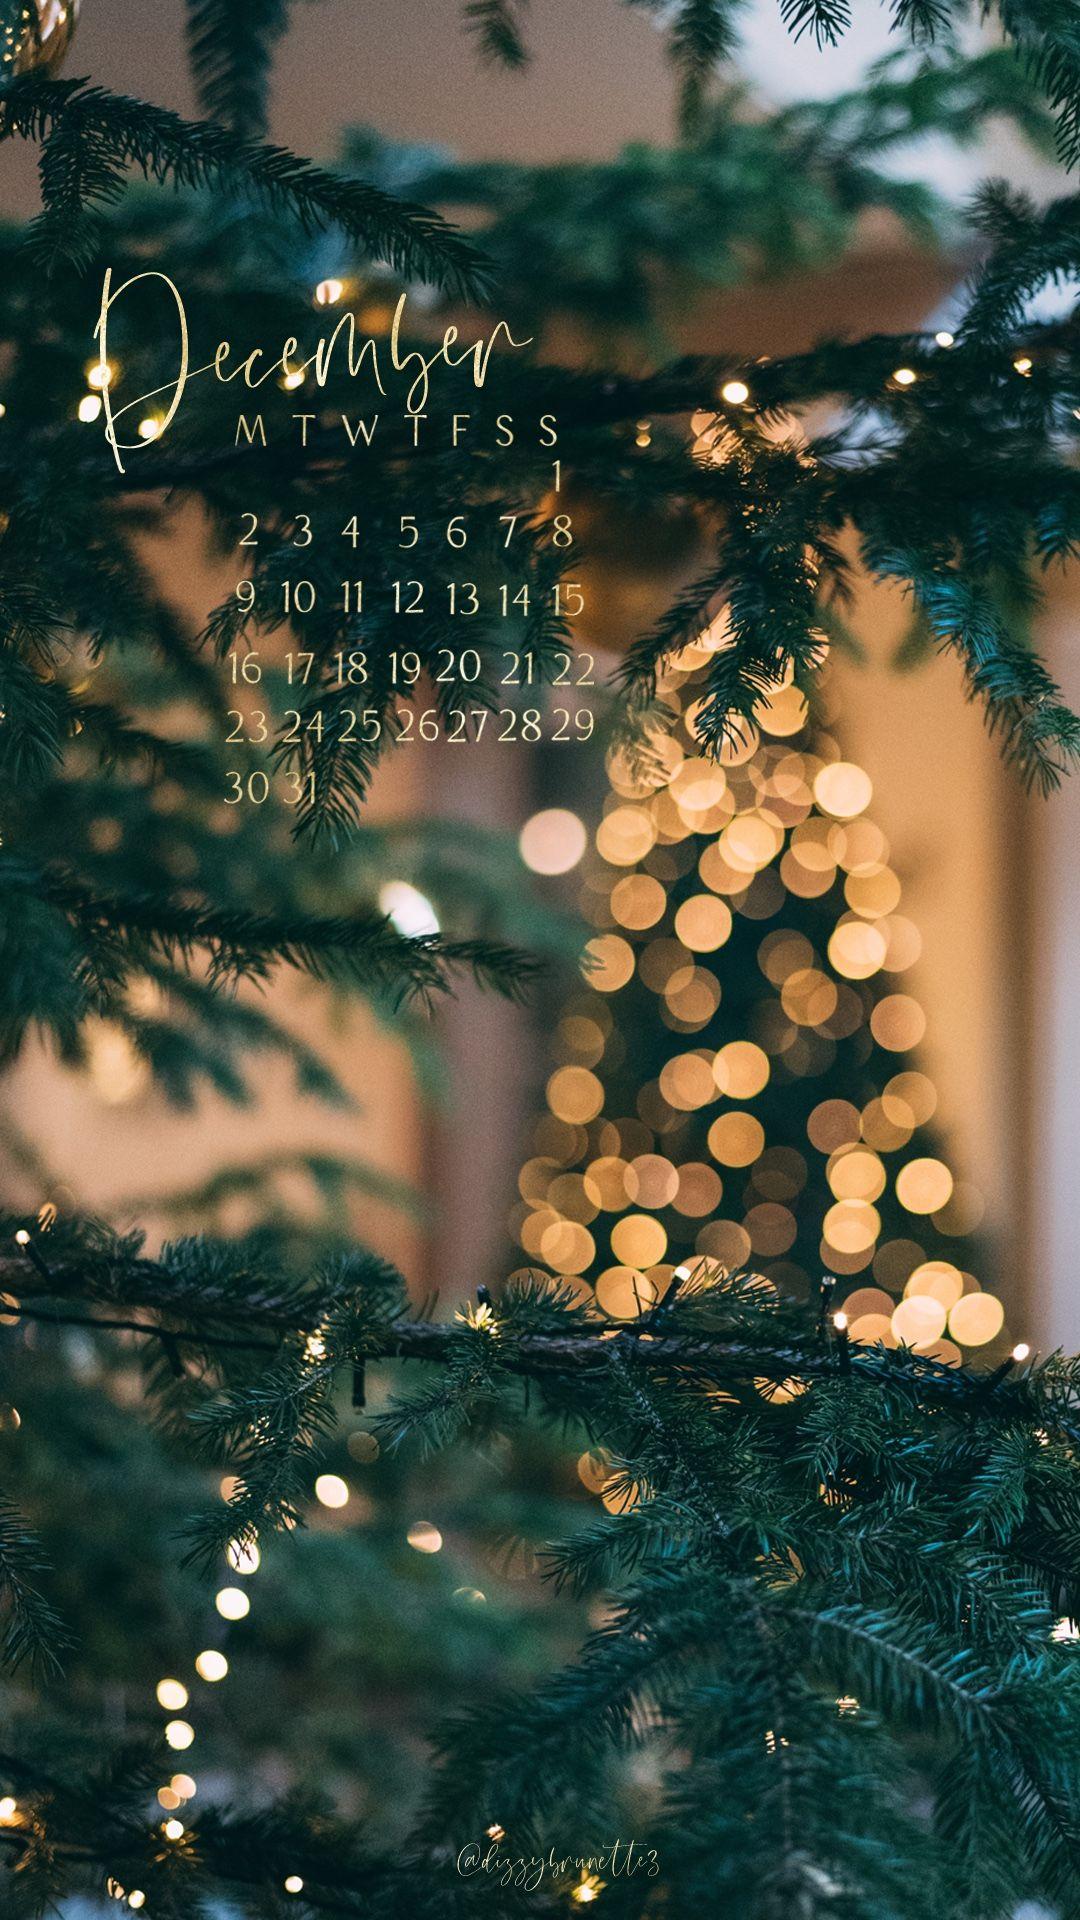 November wallpaper, November locksreen, November phone